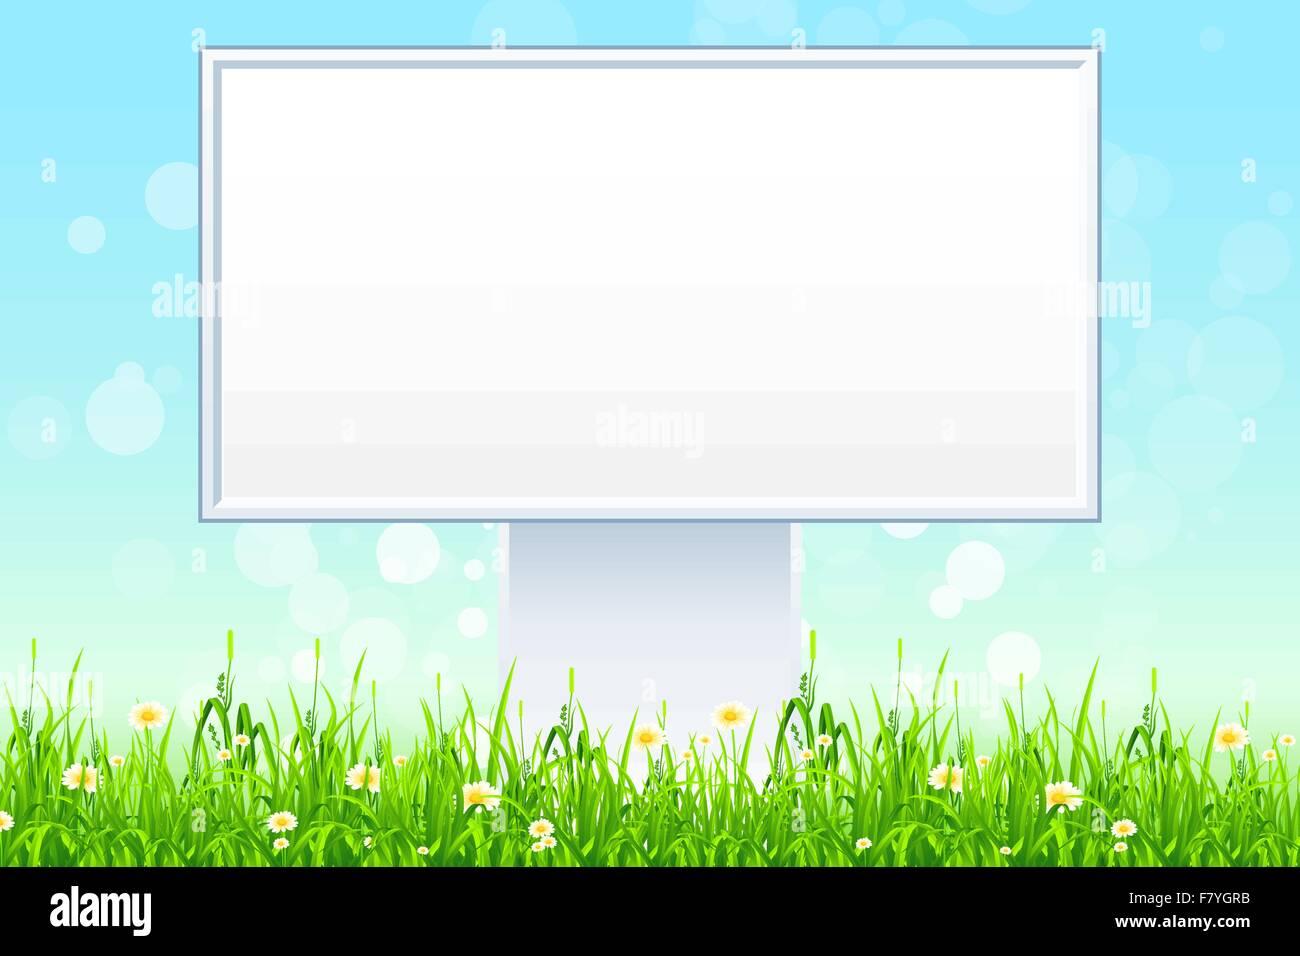 Empty Billboard in the Grass - Stock Image